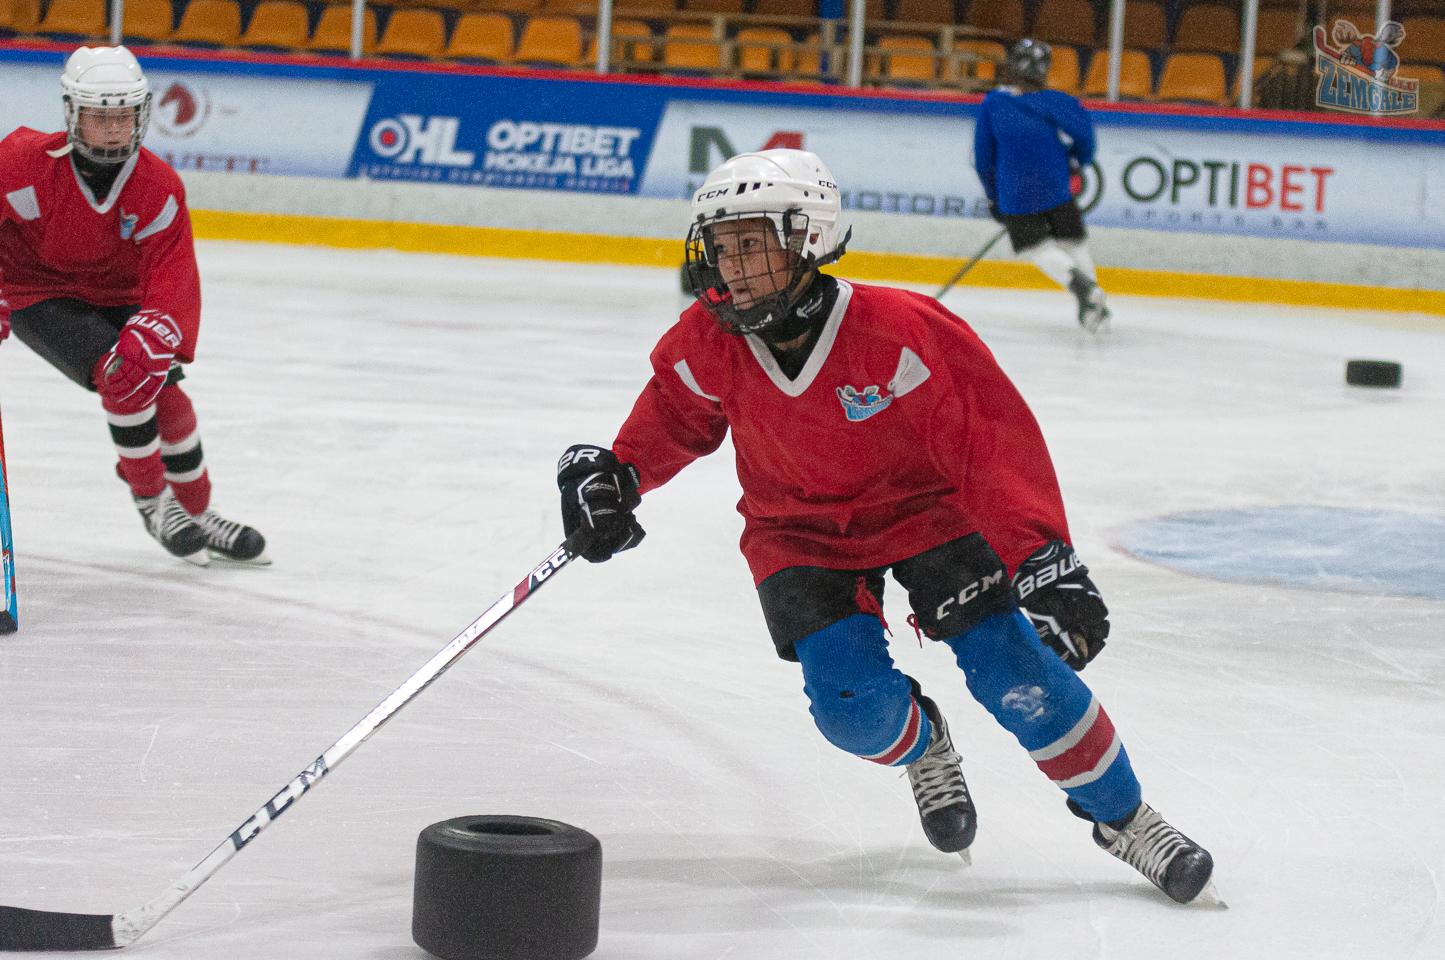 JLSS U15 hokejisti trenējās